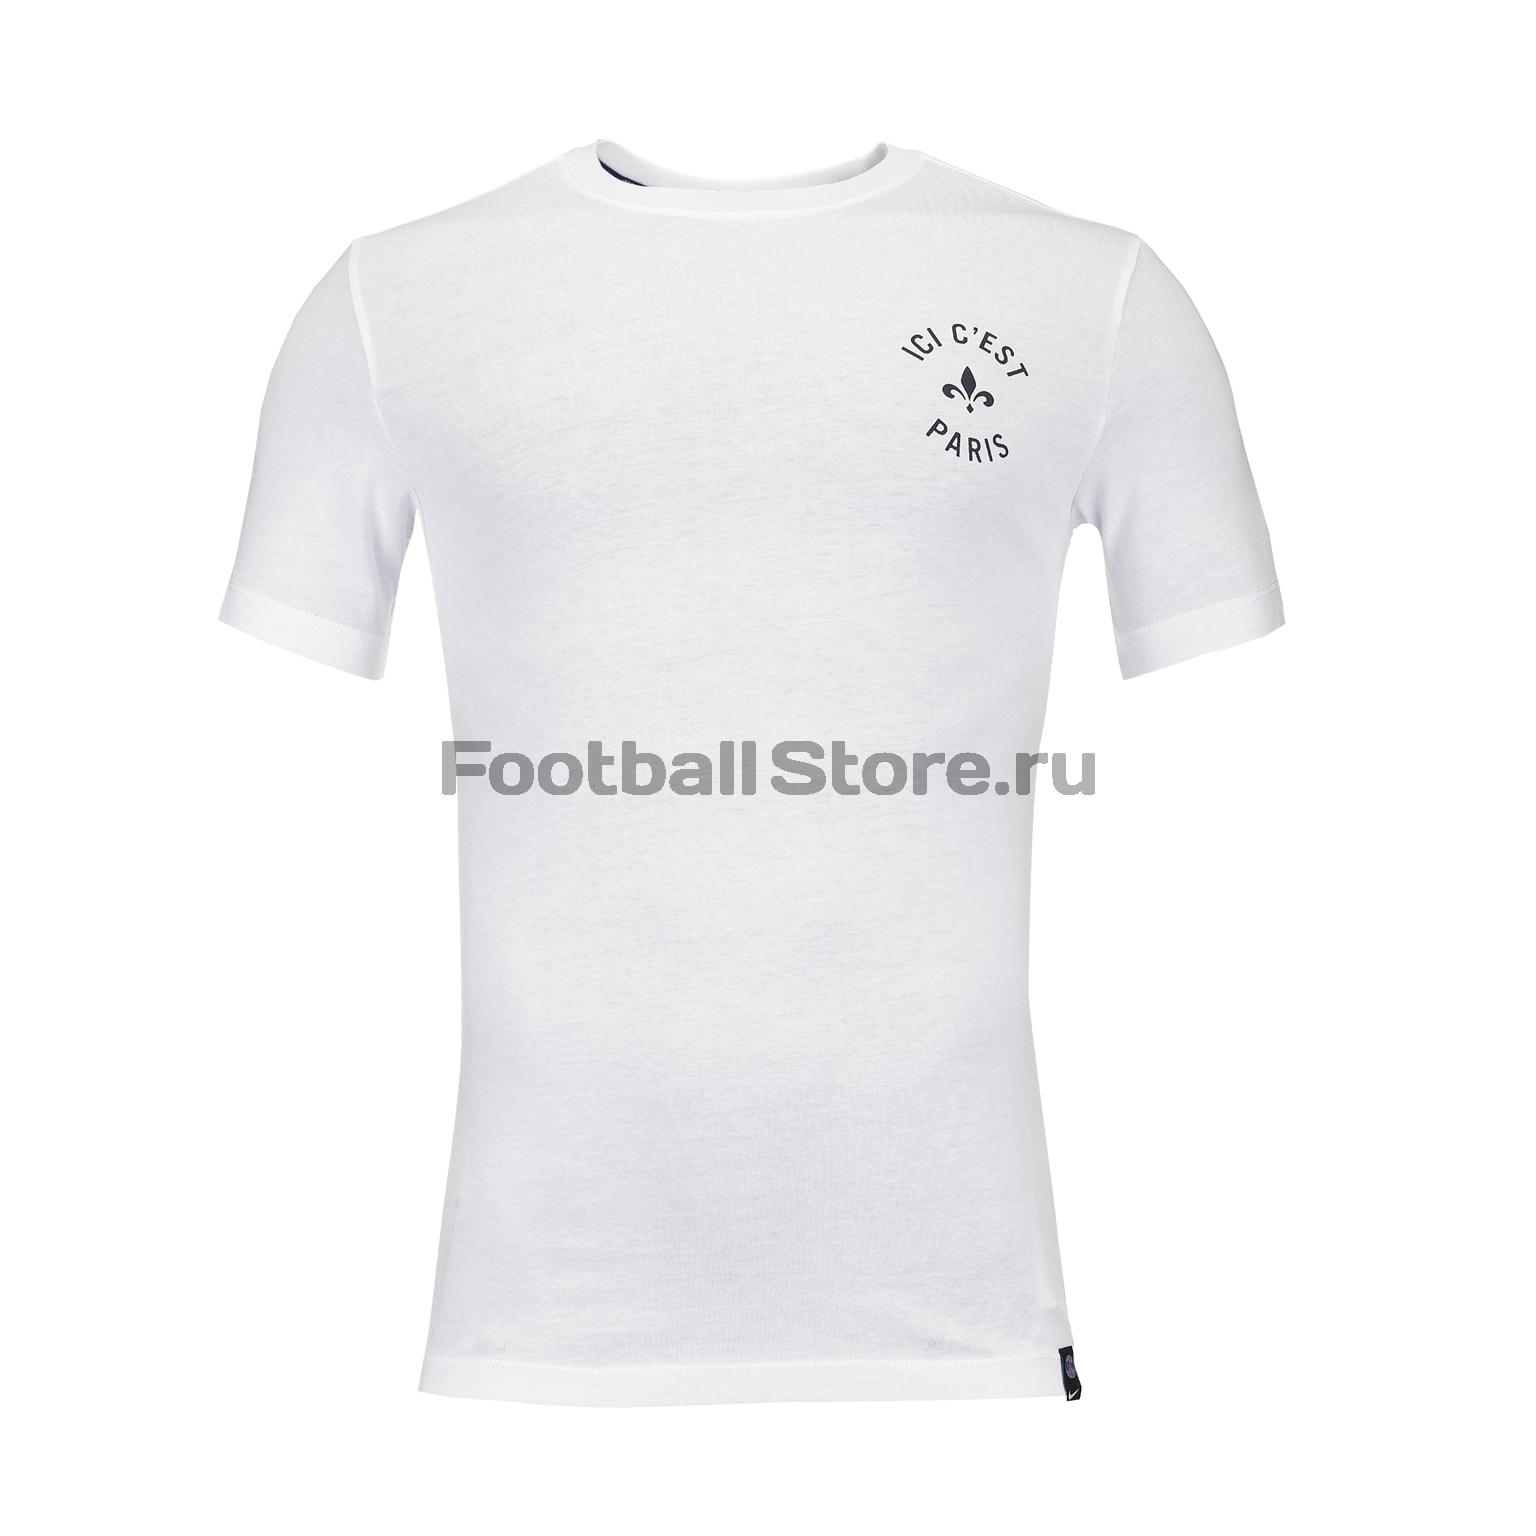 Футболка Nike PSG Tee Kit Story Tell AQ7520-100 цена